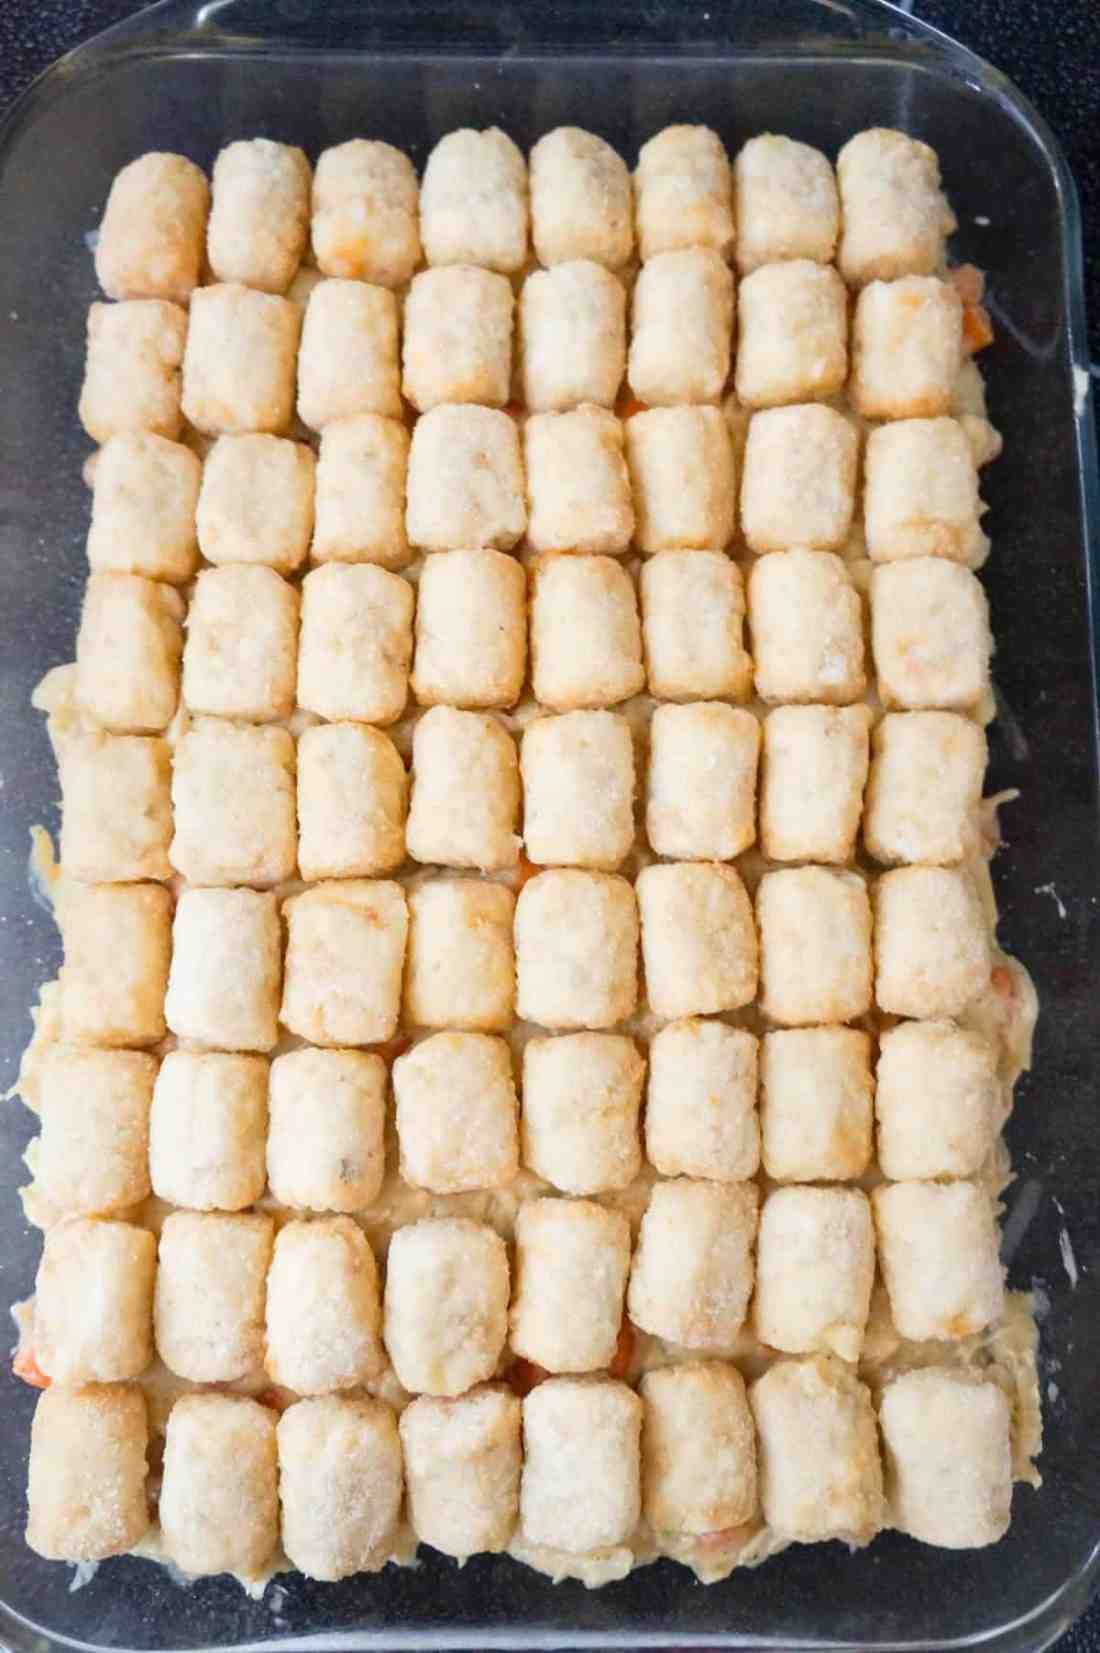 frozen tater tots on top of chicken pot pie casserole